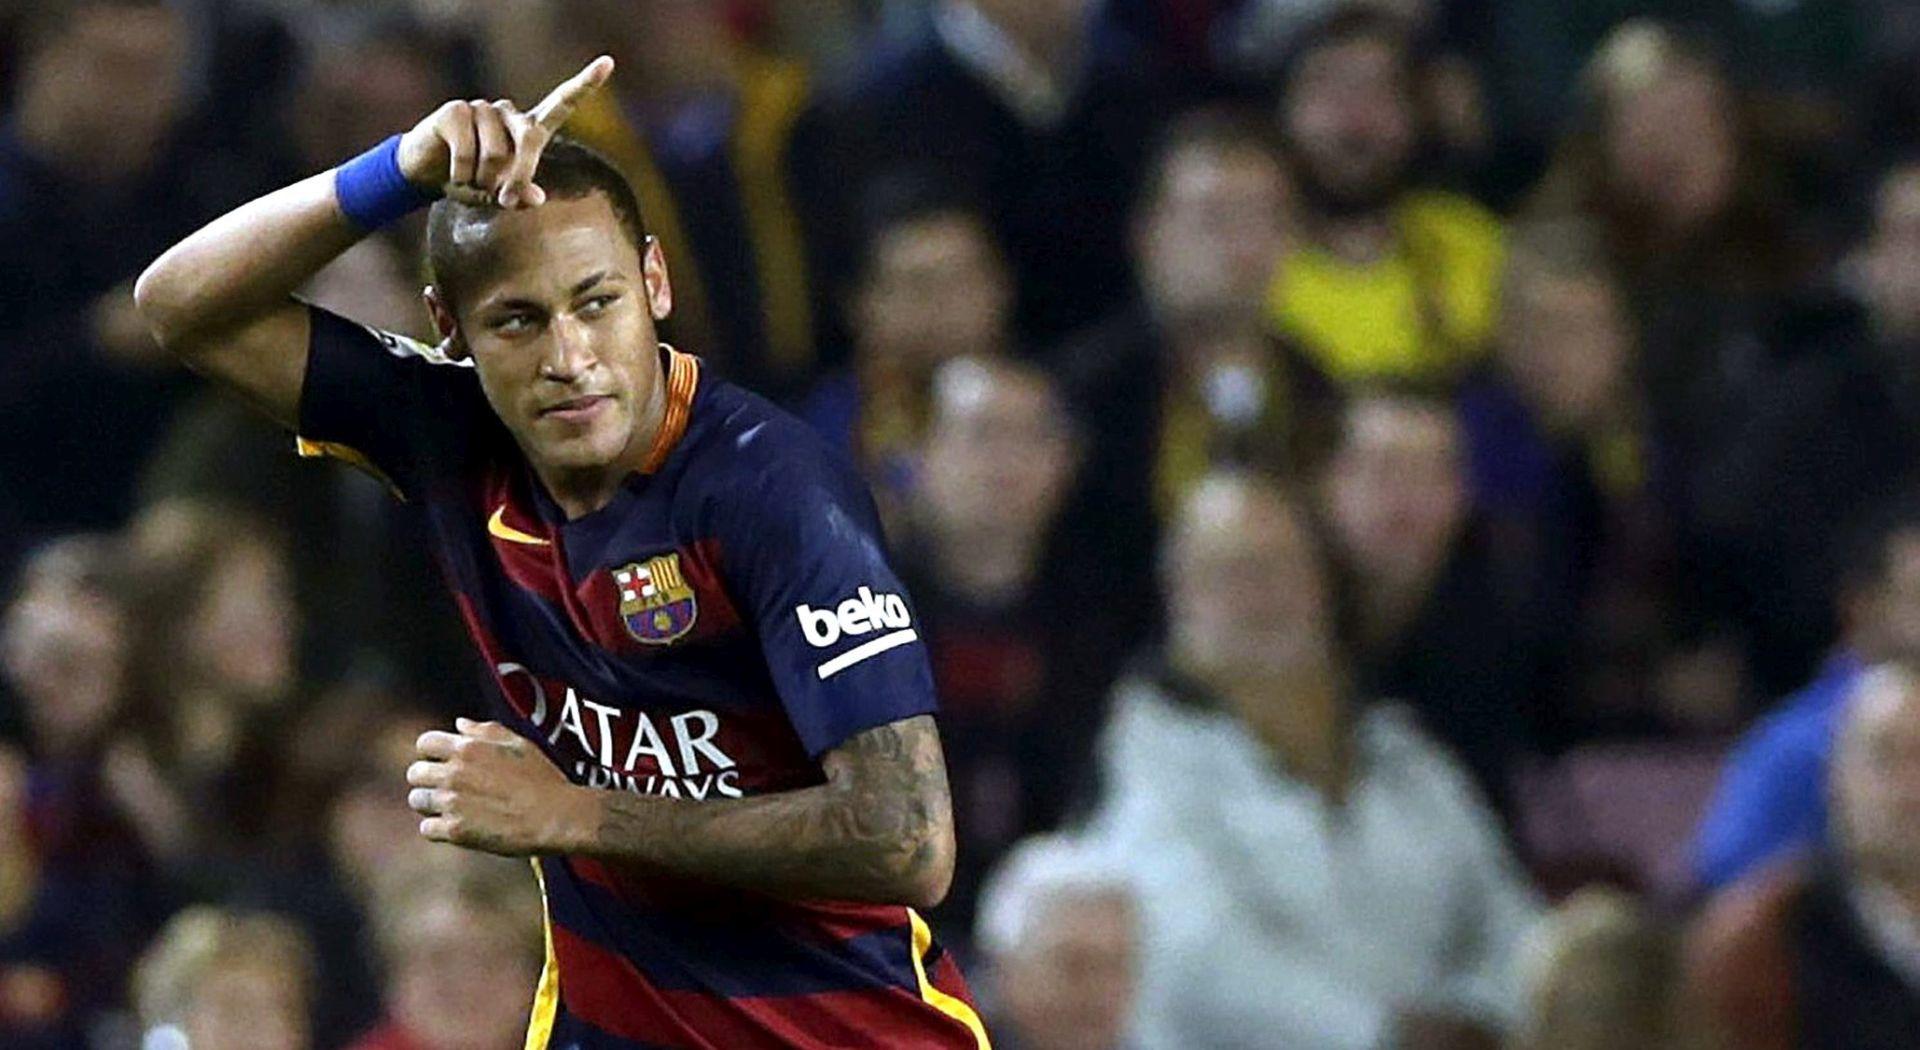 VELIKA VEČER BRAZILCA Četiri gola Neymara u preokretu Barcelone